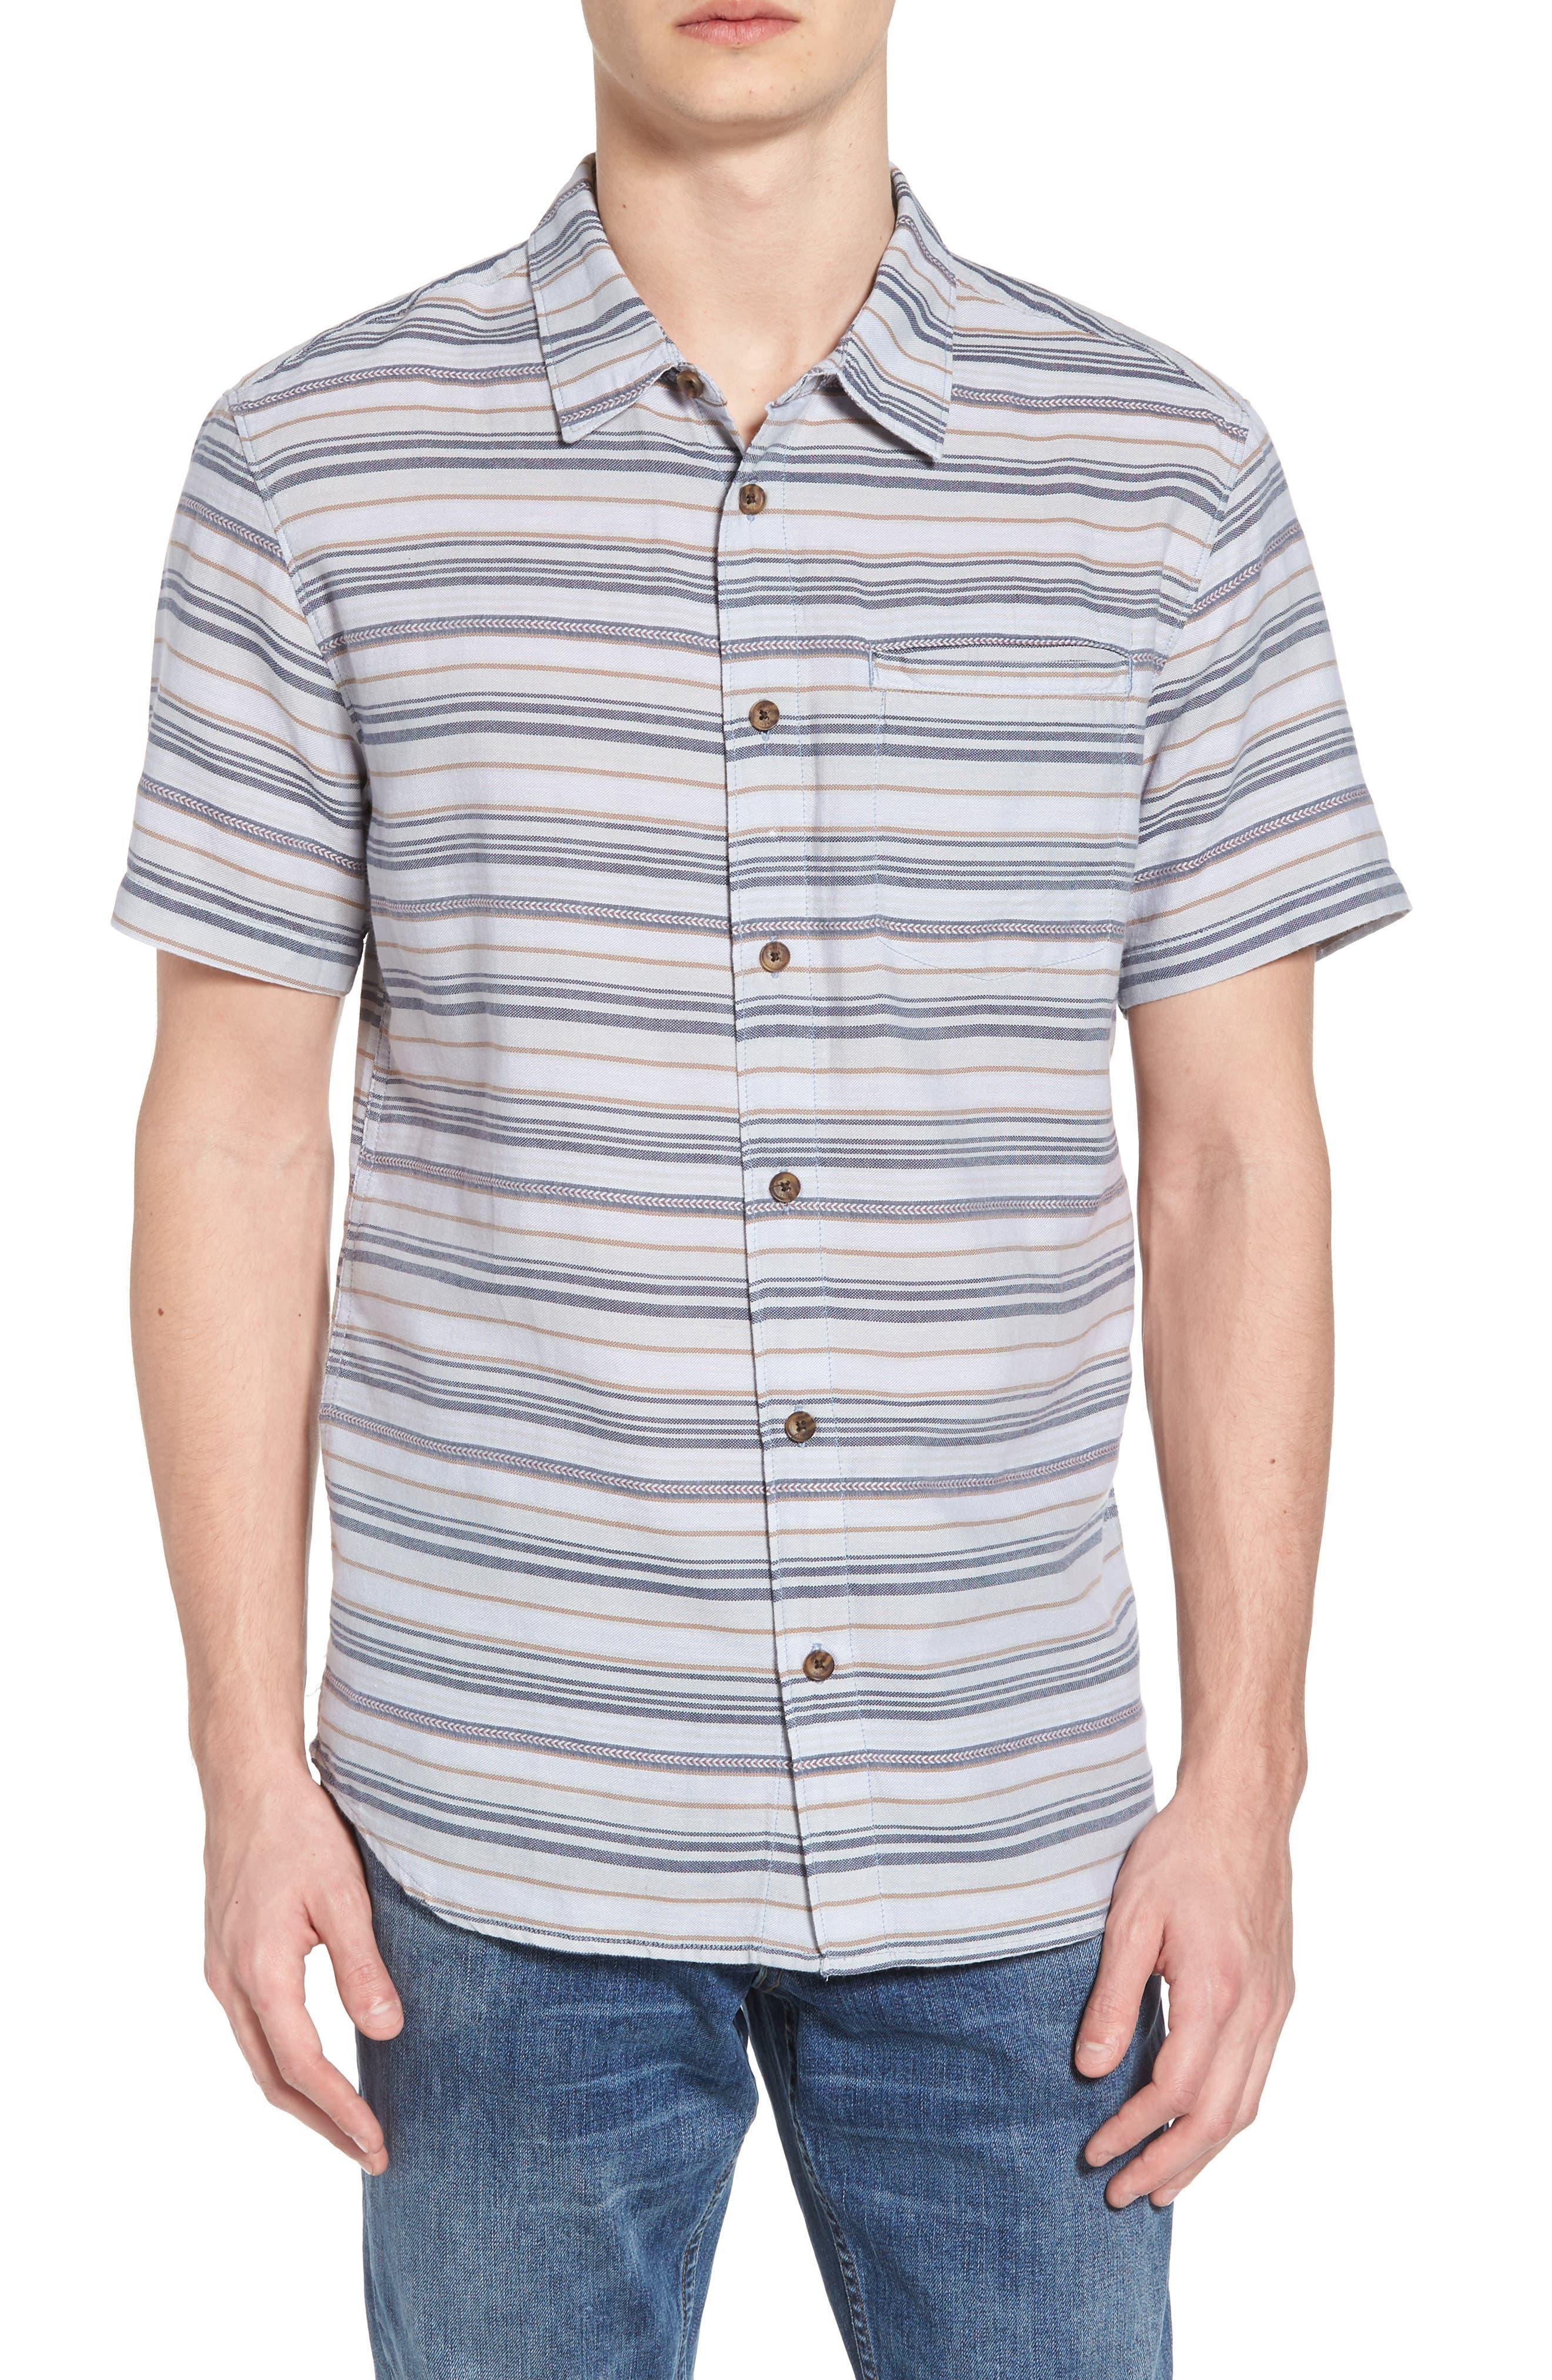 Currington Short Sleeve Shirt,                             Main thumbnail 2, color,